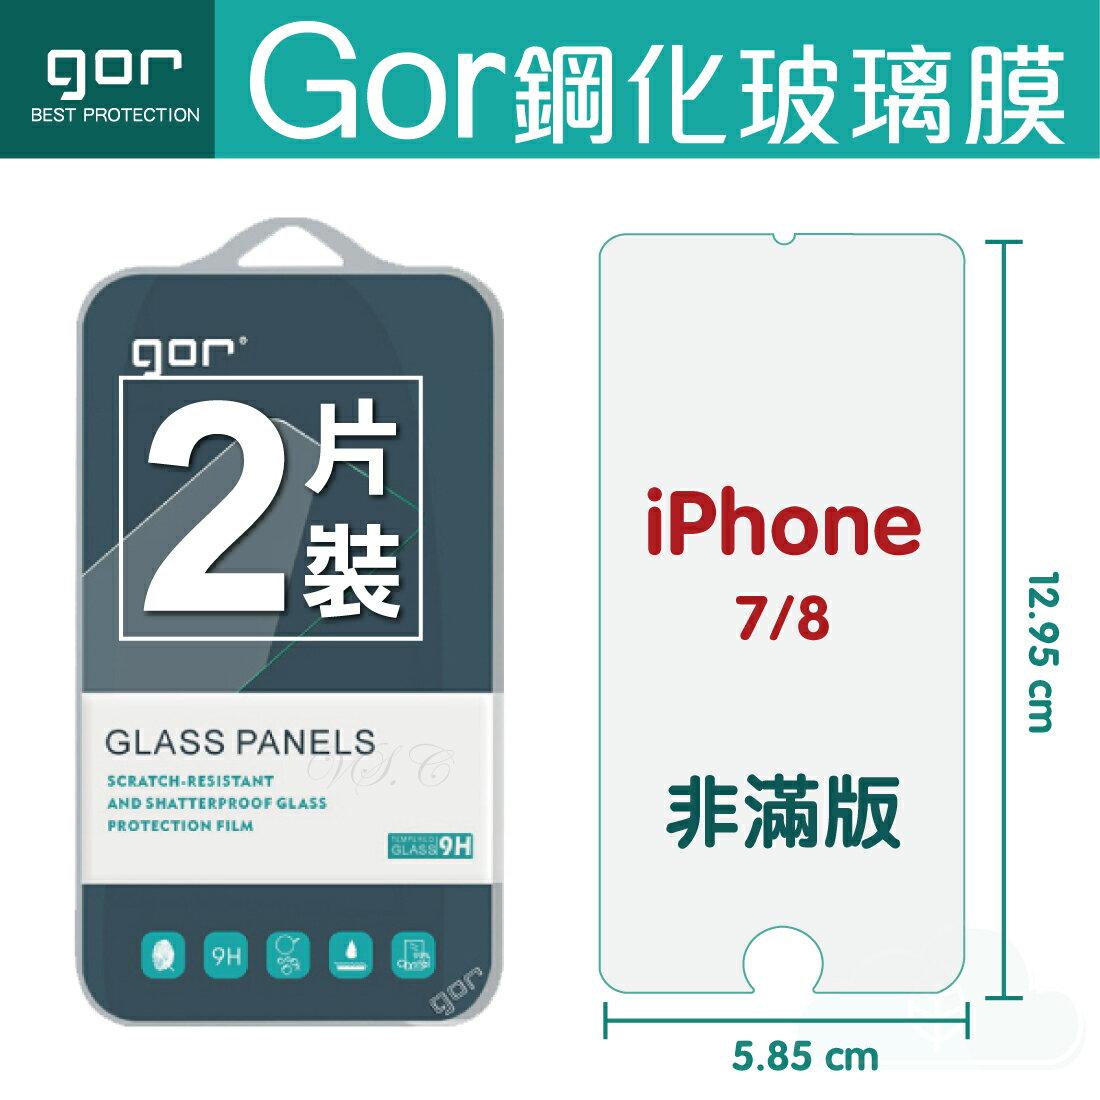 【Apple】 GOR 9H iPhone 7 / 8 鋼化 玻璃 保護貼 全透明非滿版 兩片裝 【全館滿299免運費】